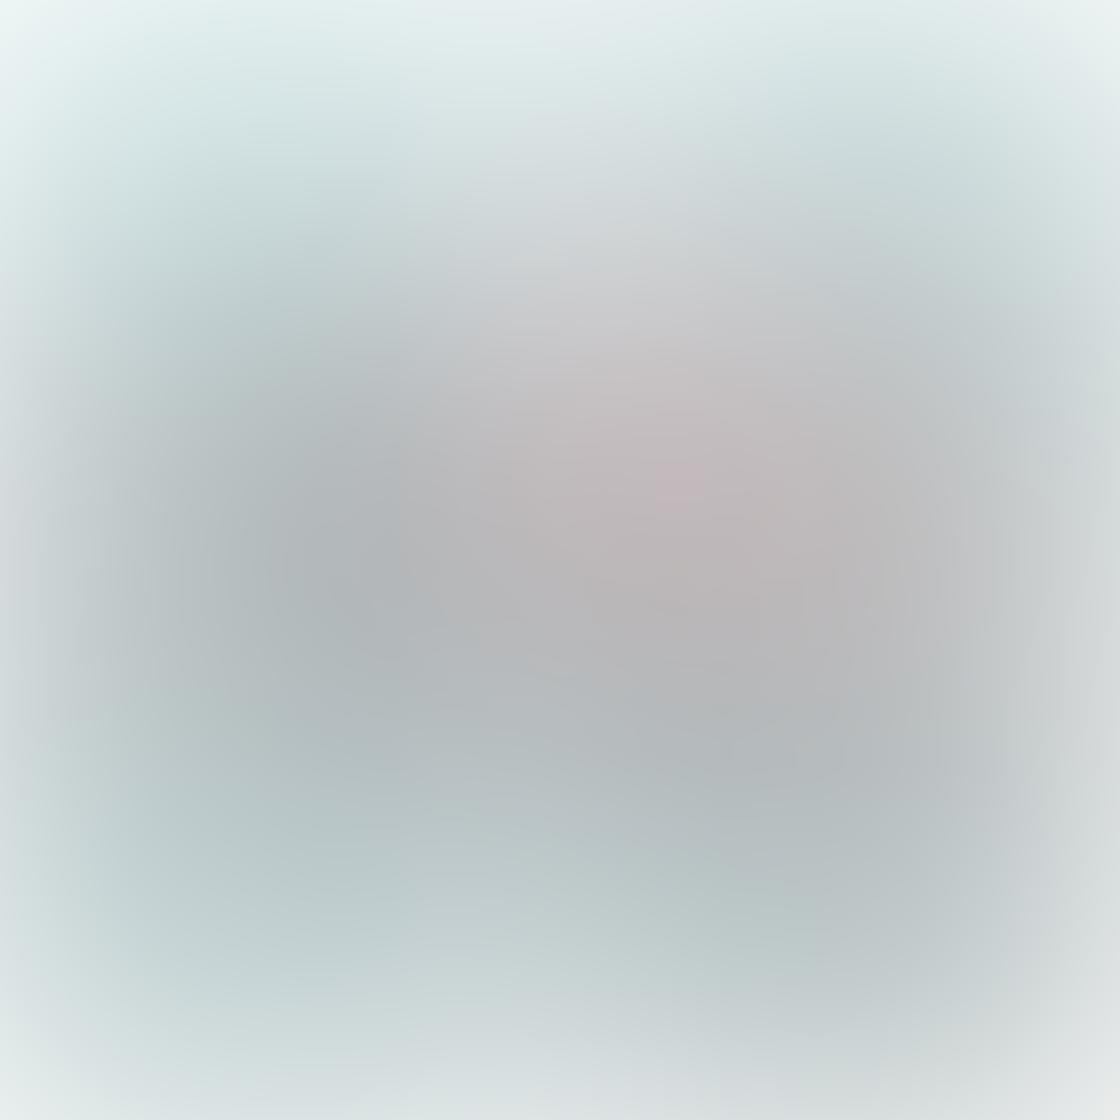 iPhone Weather Photo 17